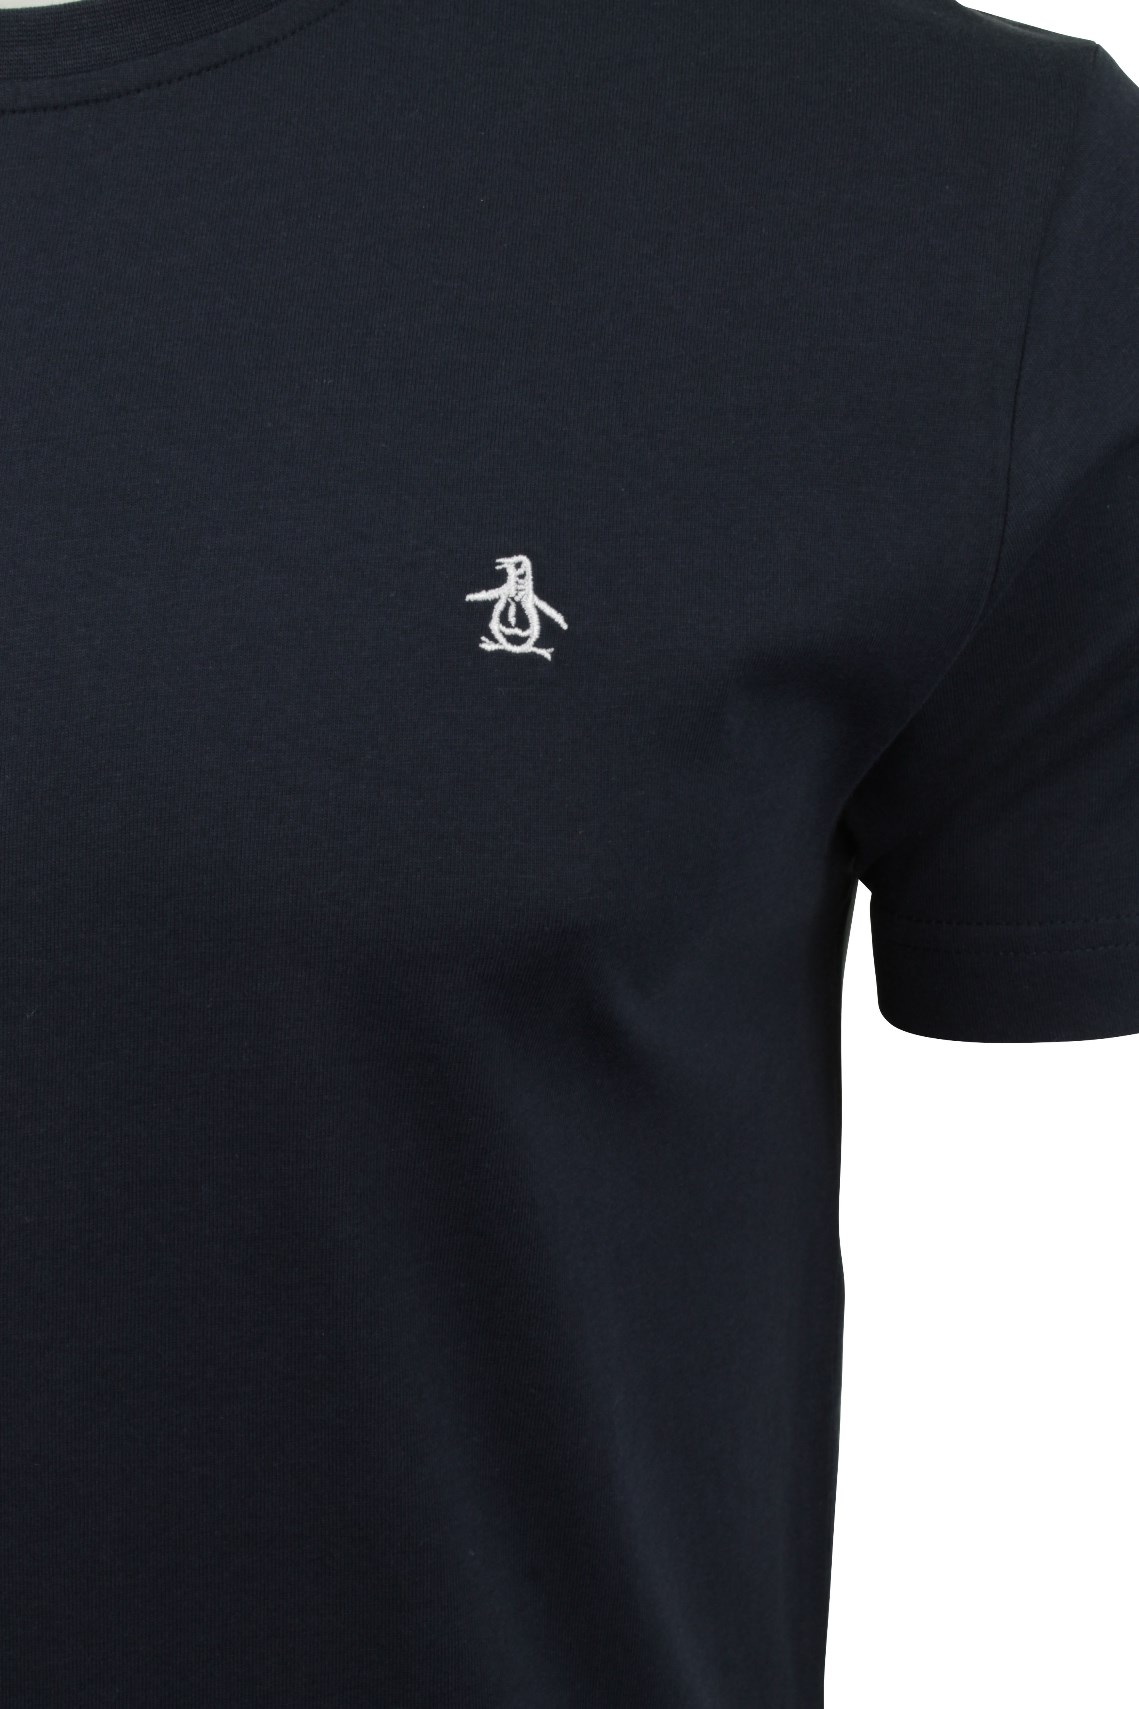 Mens-T-Shirt-by-Original-Penguin-Crew-Neck-Short-Sleeved thumbnail 16